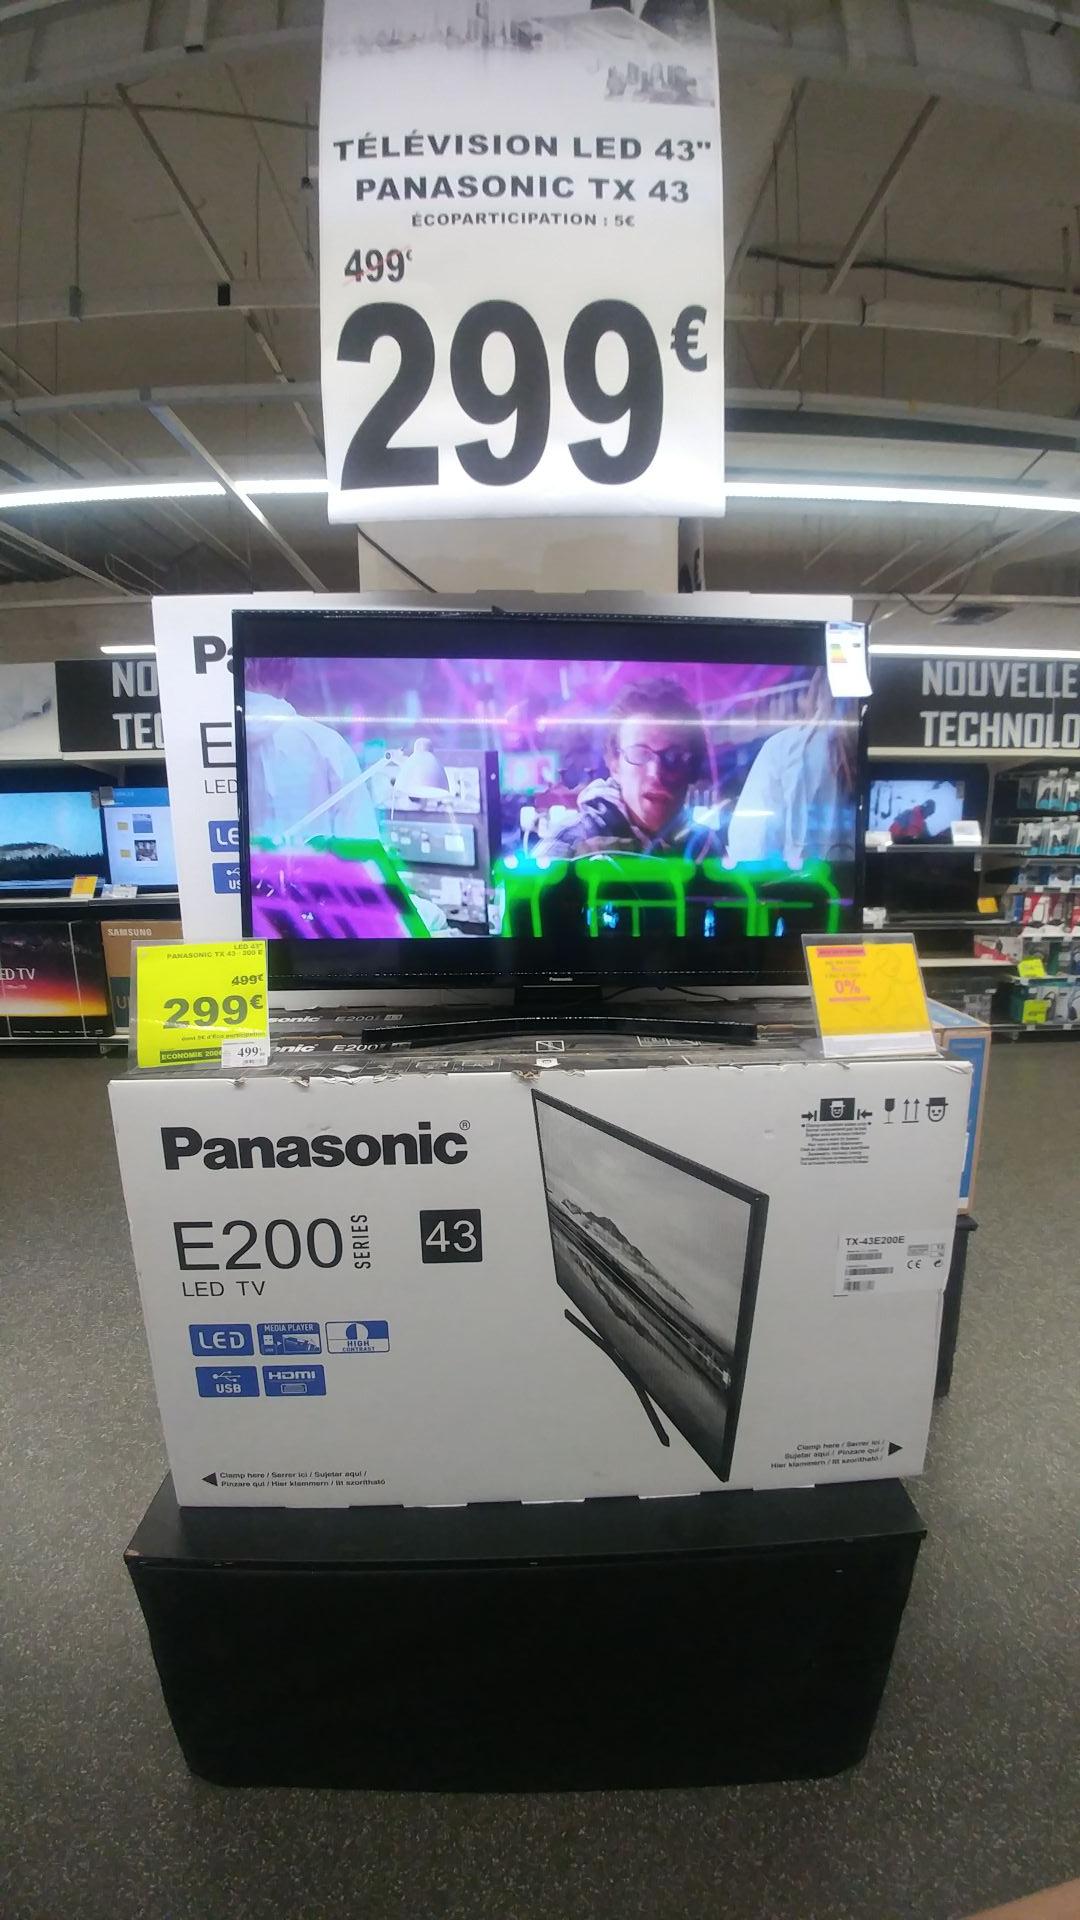 "TV 43"" Panasonic TX-43E200E à Auchan Les QuatreTemps (92)"